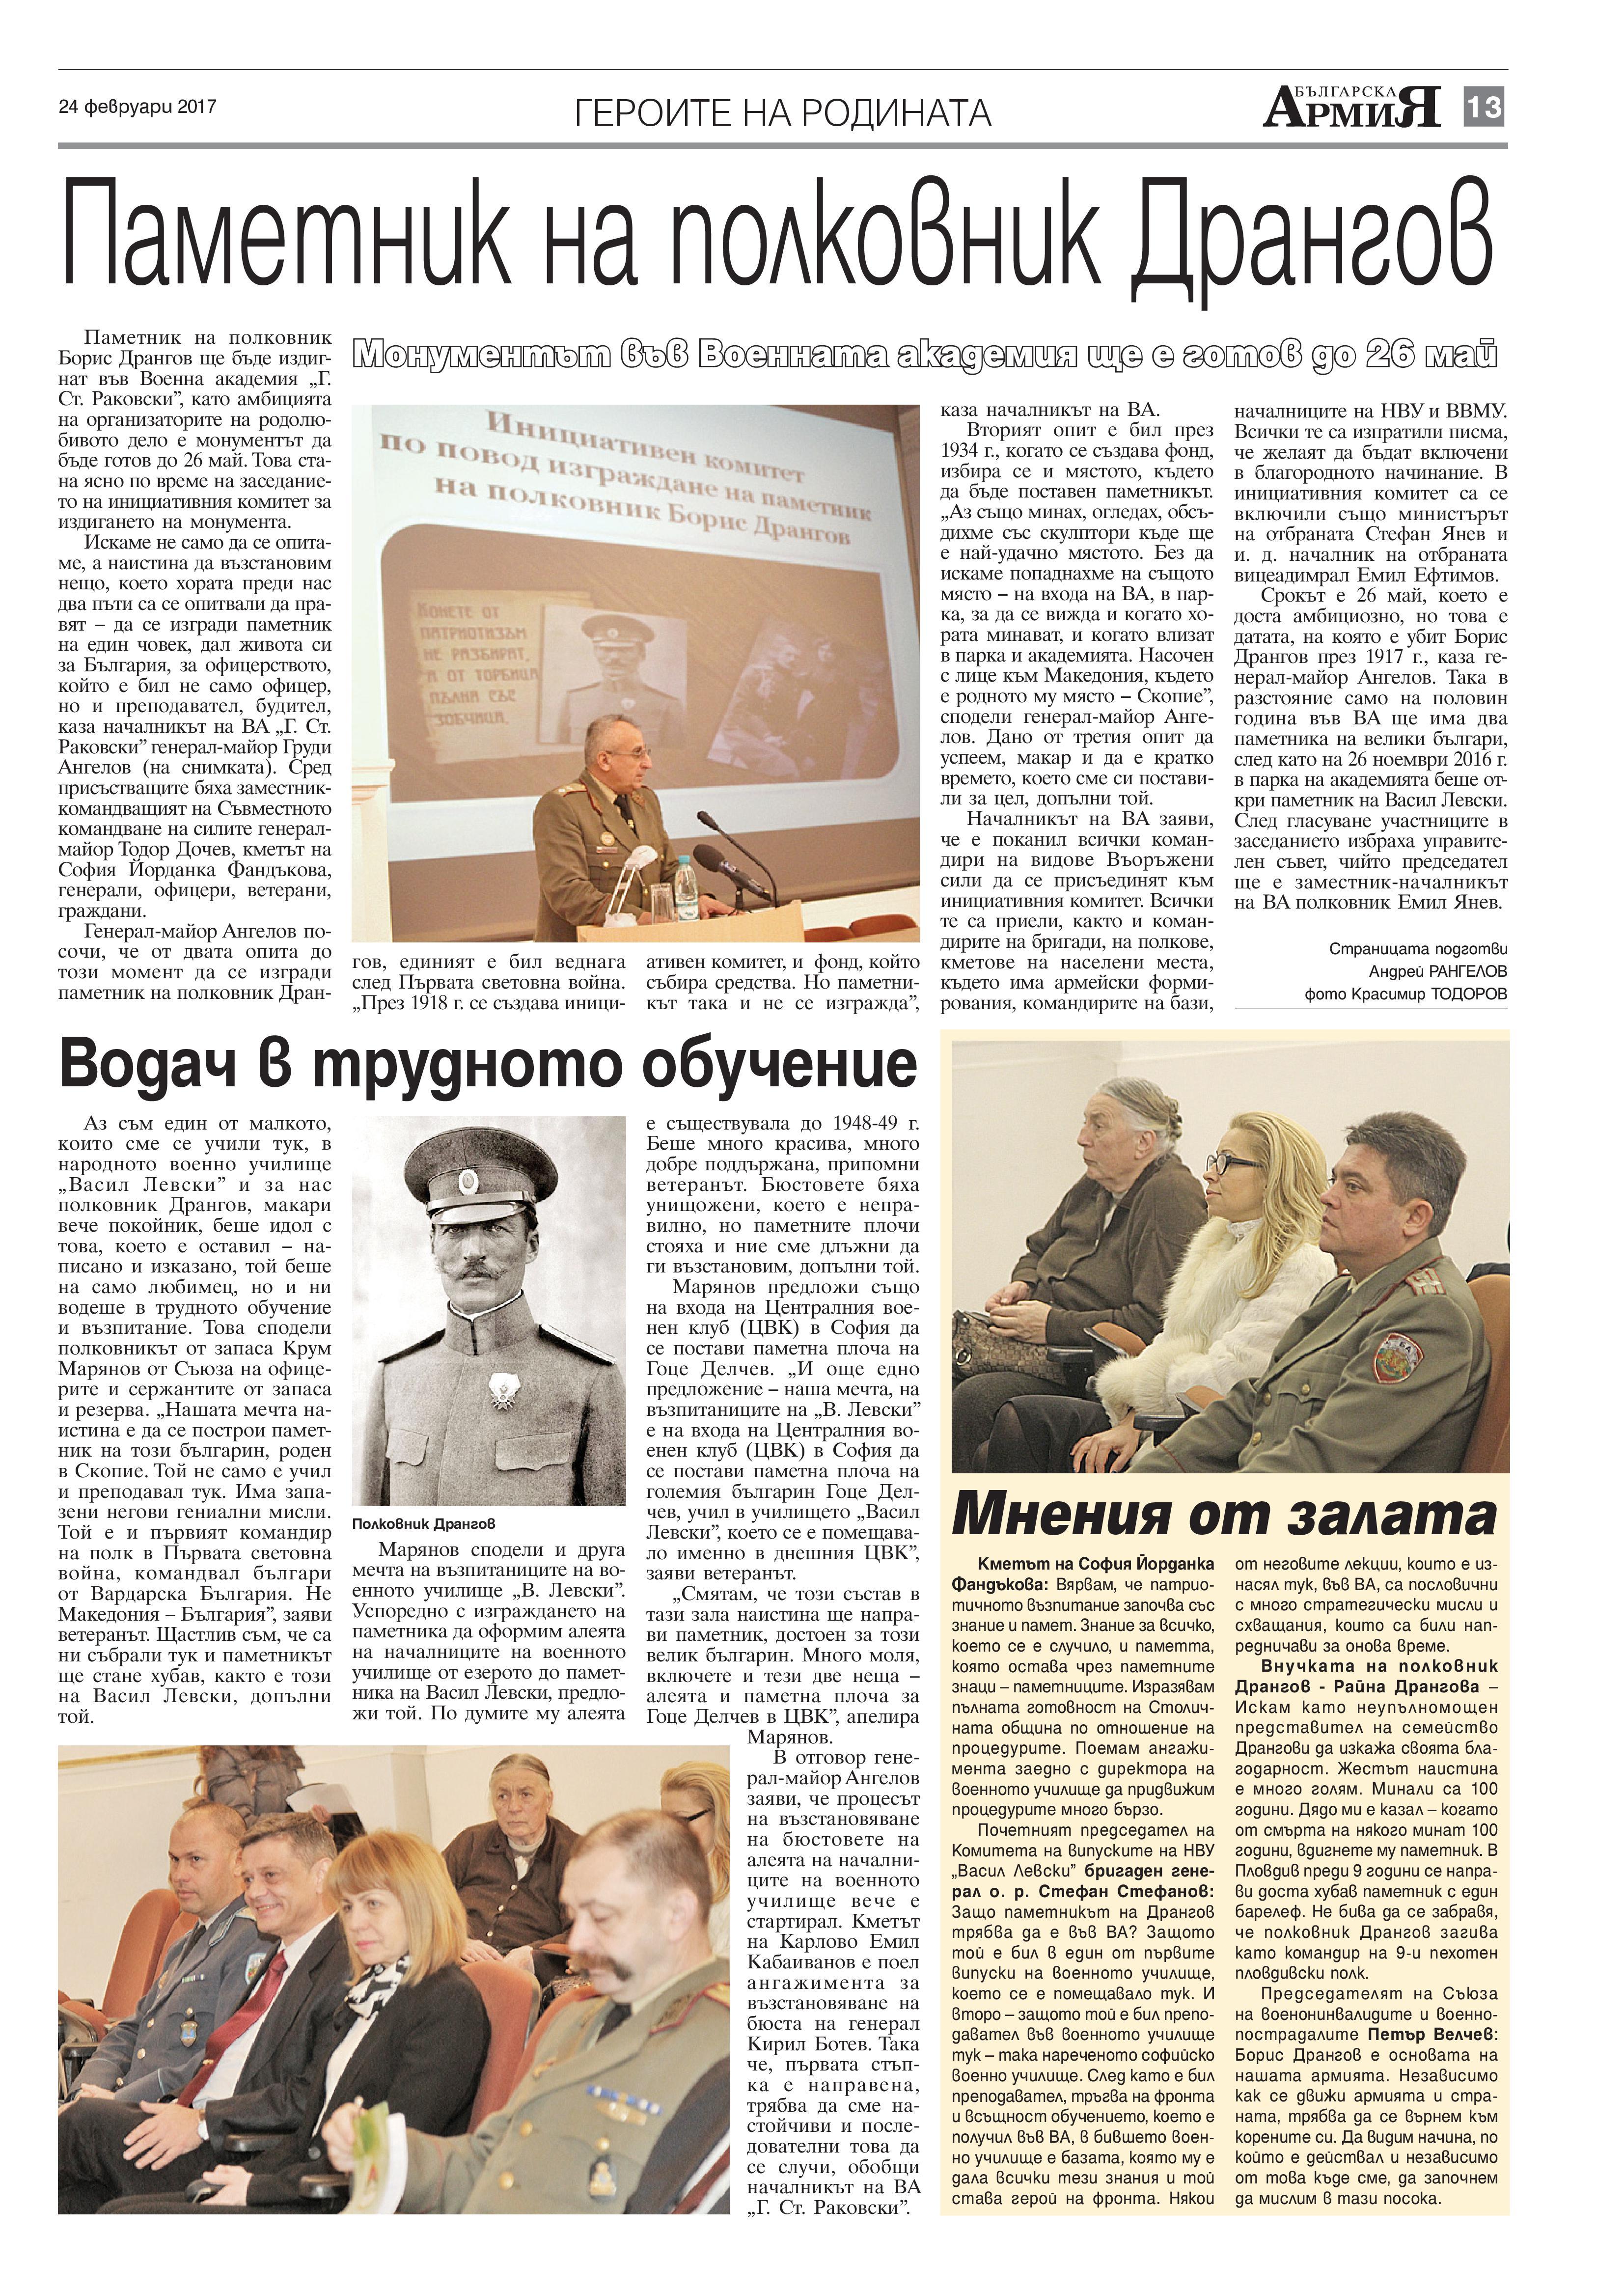 https://www.armymedia.bg/wp-content/uploads/2017/02/13-1.jpg